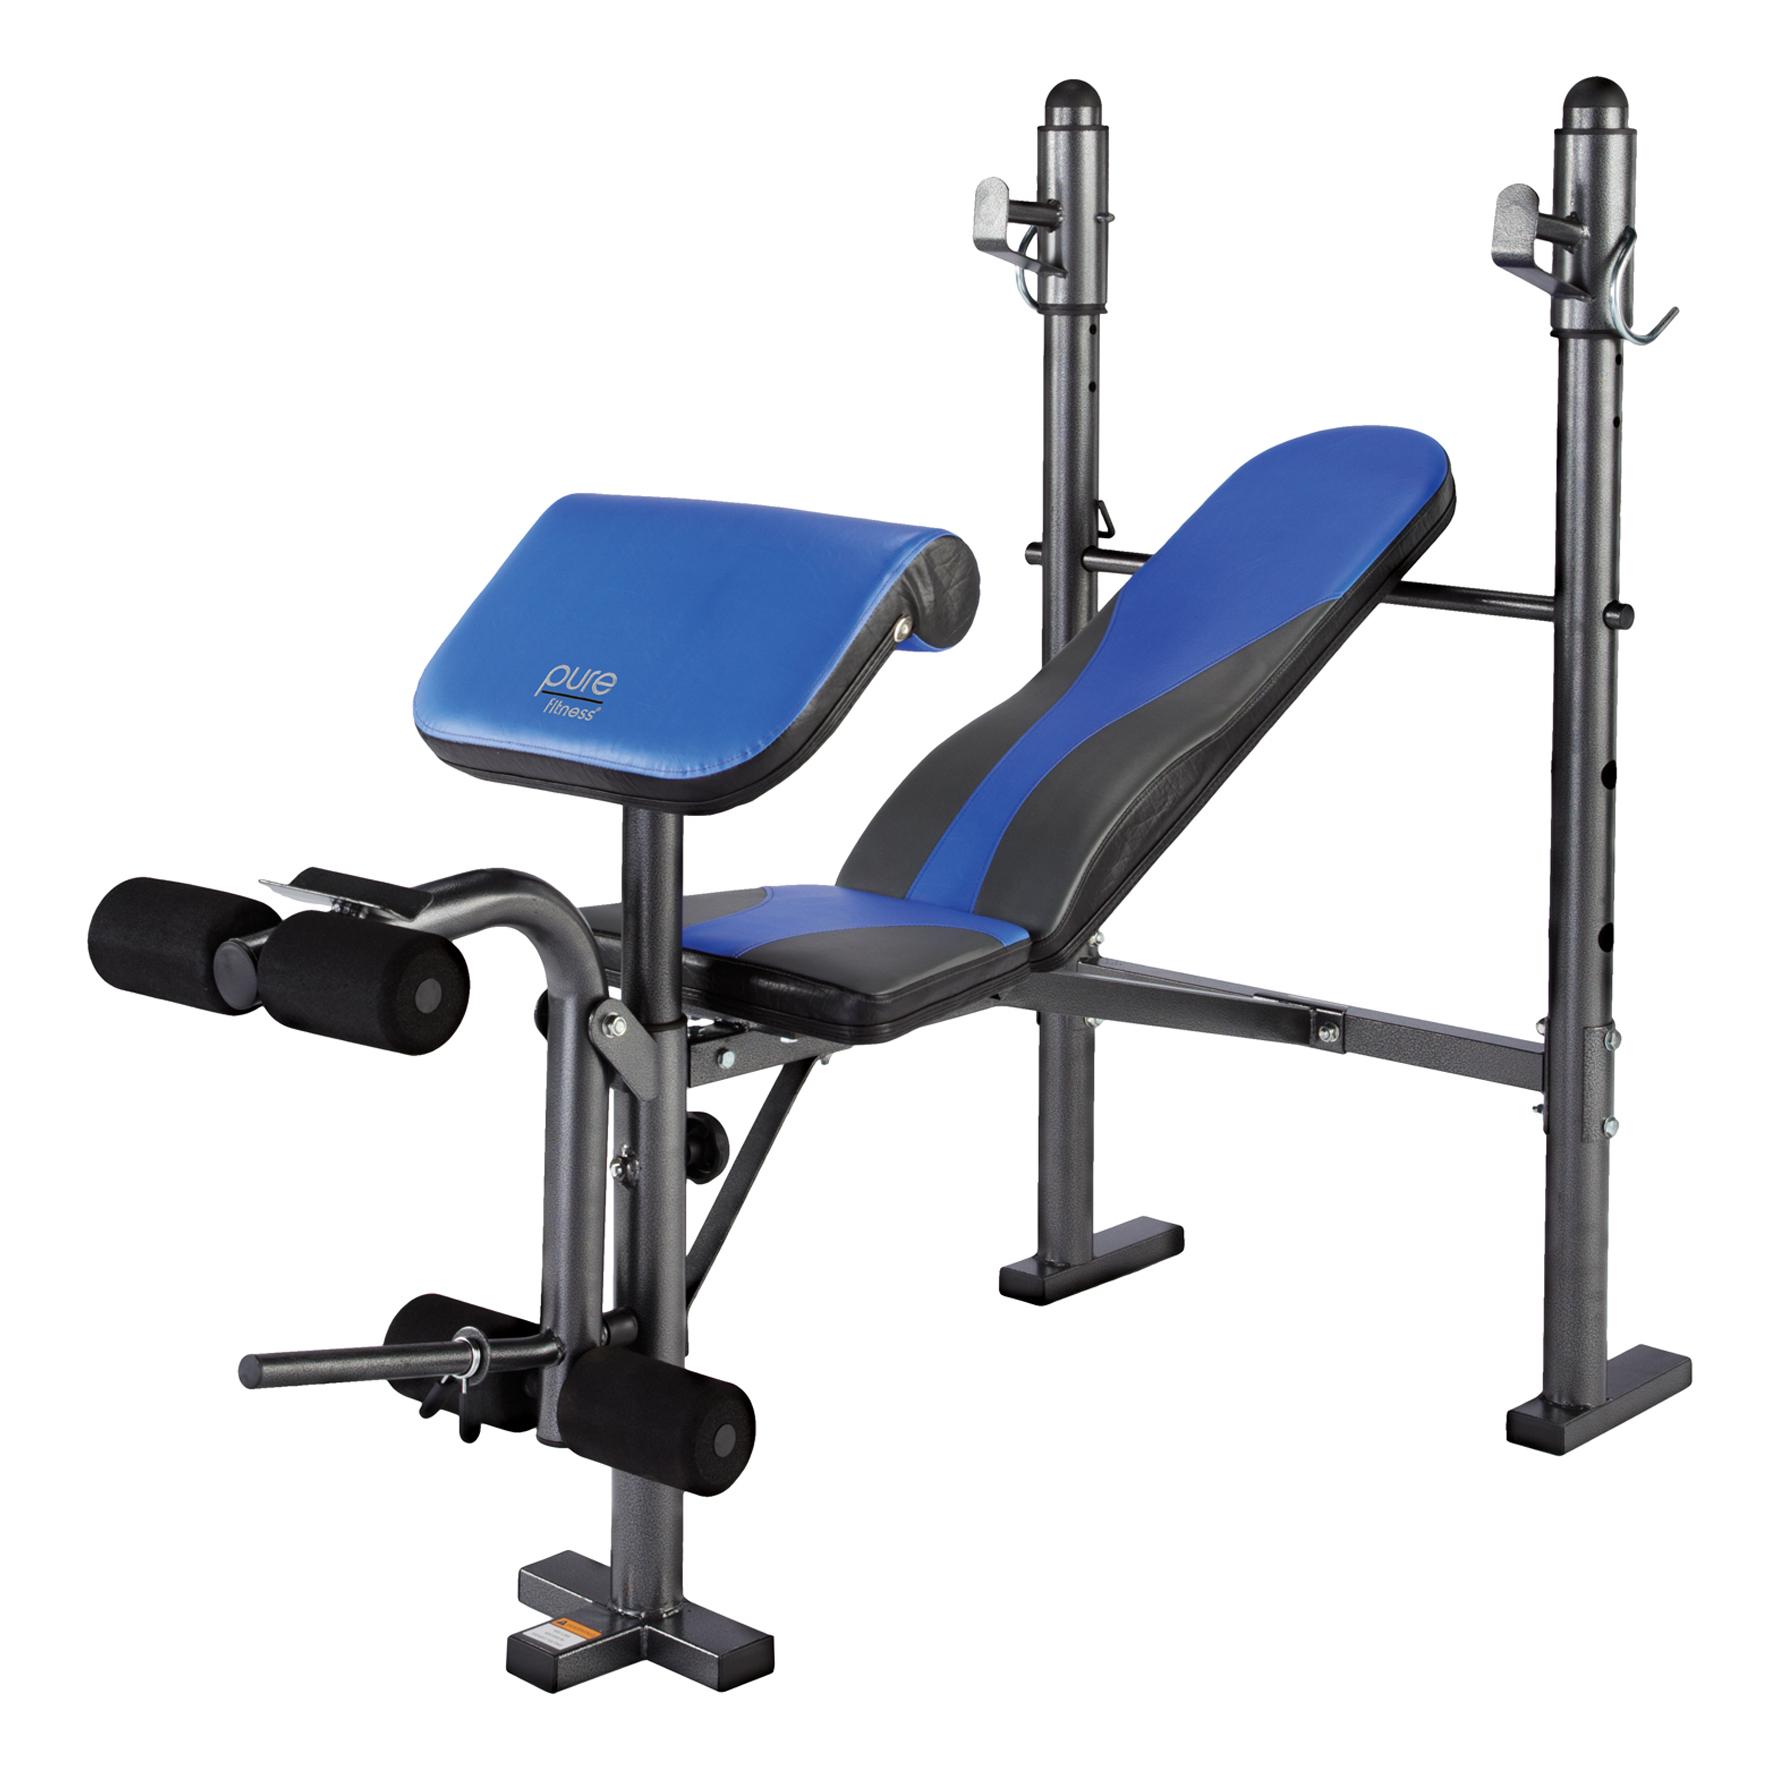 Pure Fitness Multi Purpose Adjustable Mid Width Weight